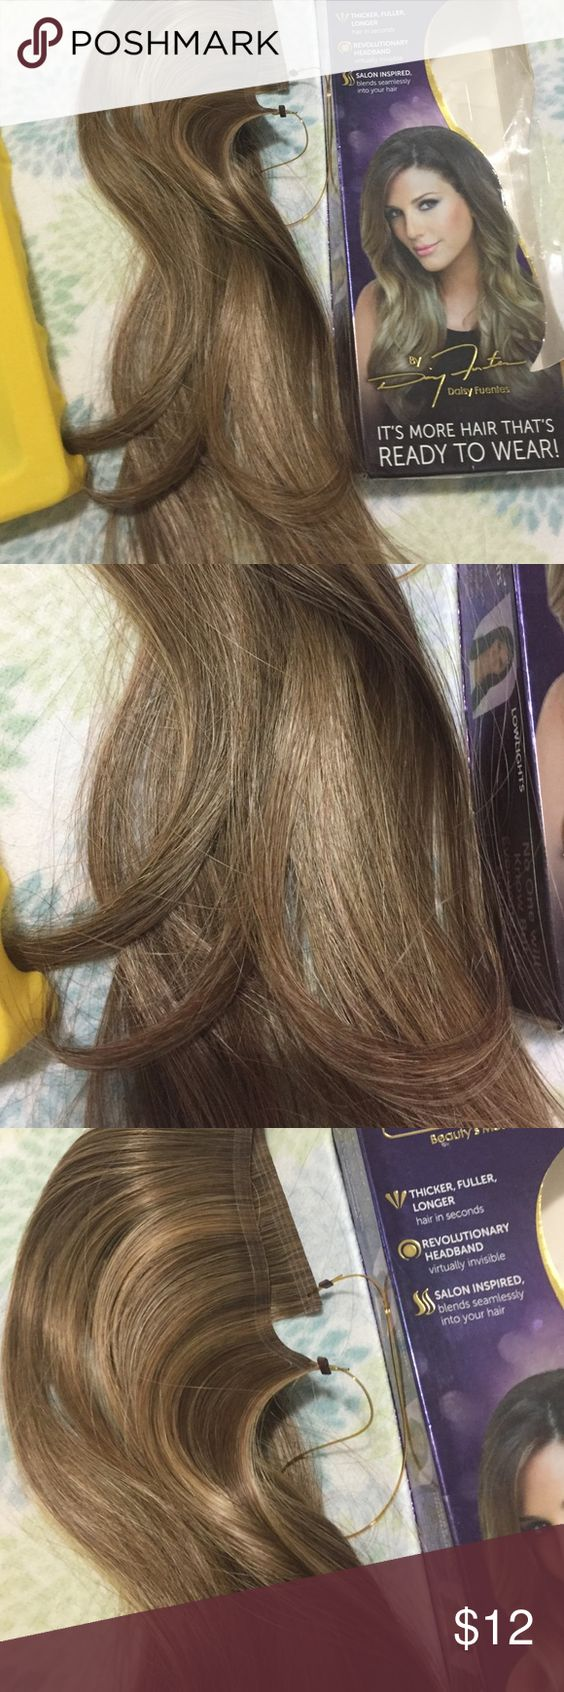 Secret Extensions In Dark Blonde New In Box Color Dark Blonde Size